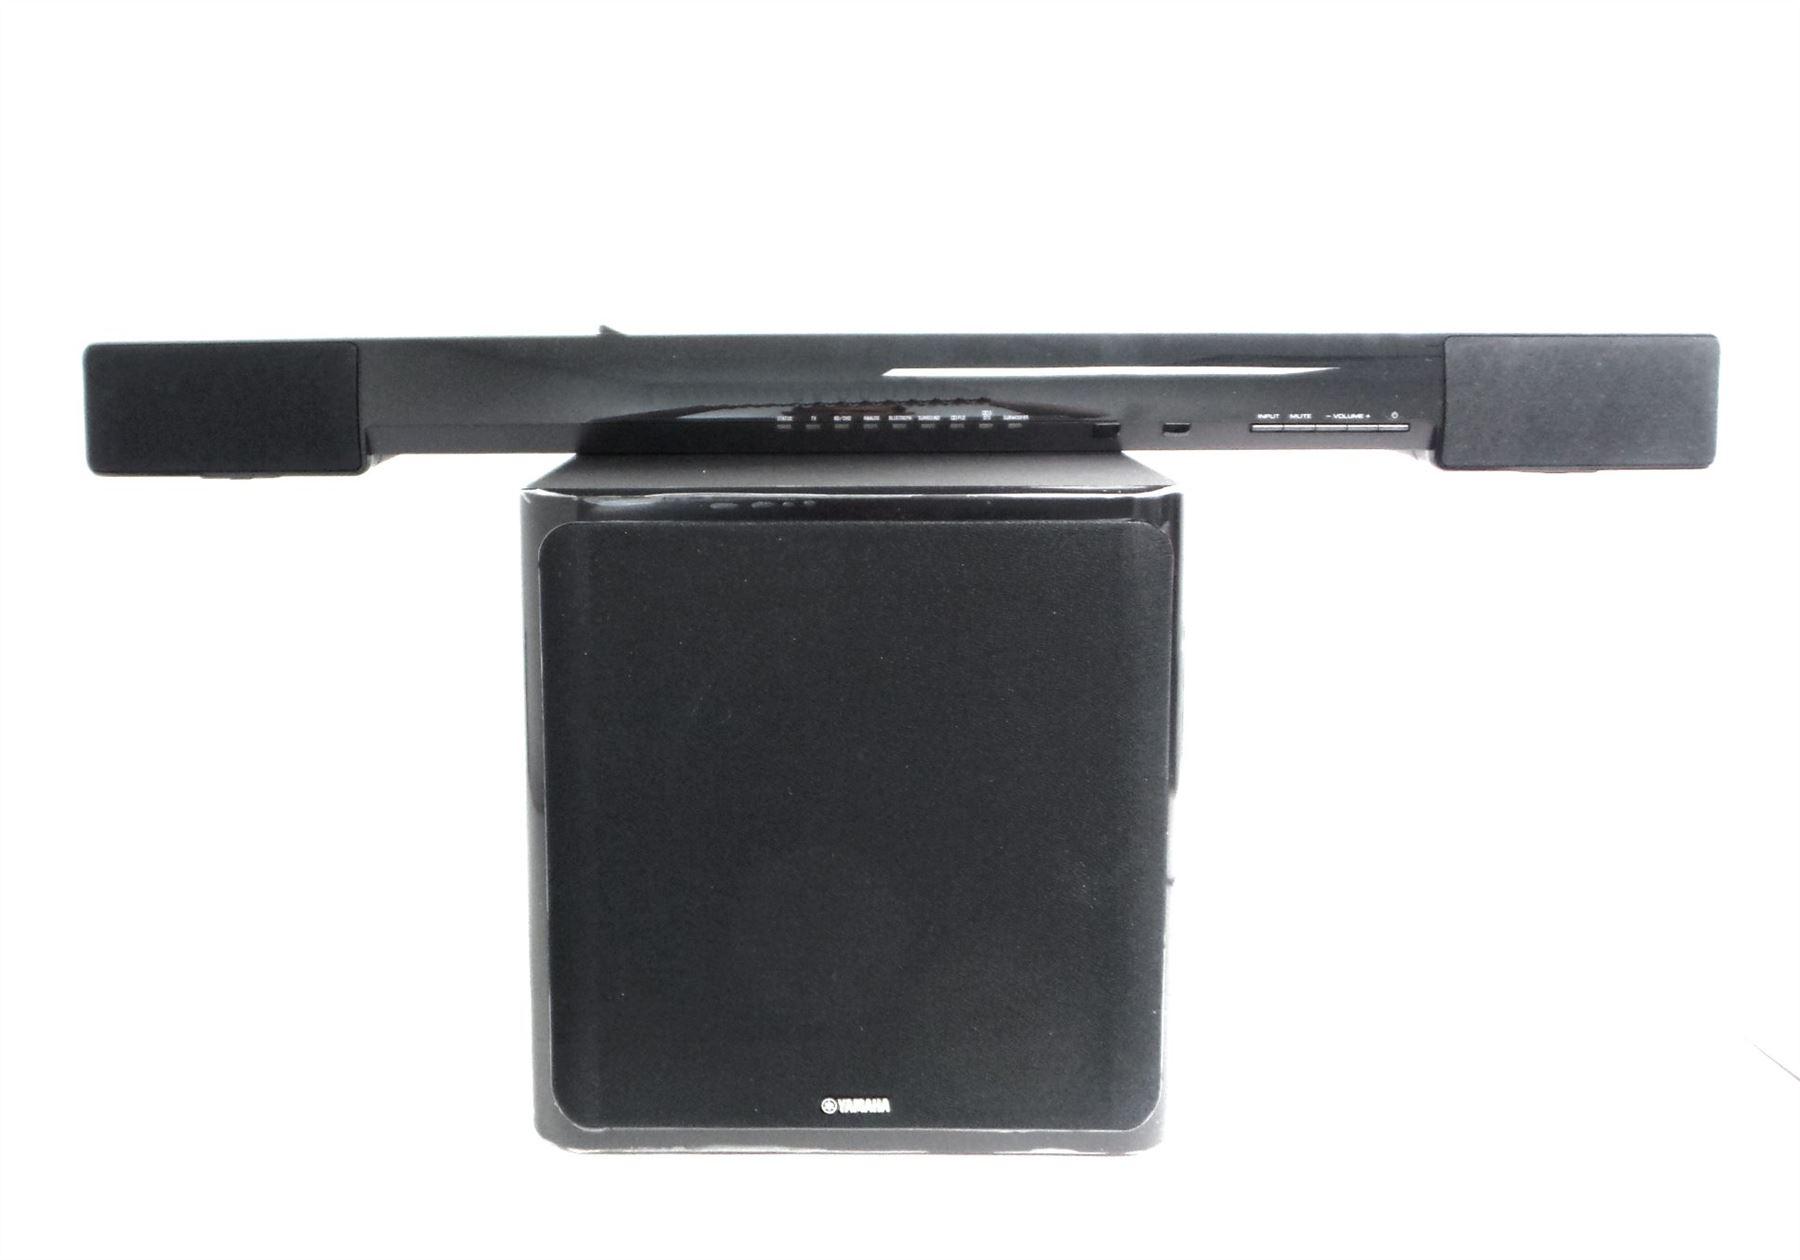 yamaha sound bar with wireless subwoofer bluetooth 2 1. Black Bedroom Furniture Sets. Home Design Ideas